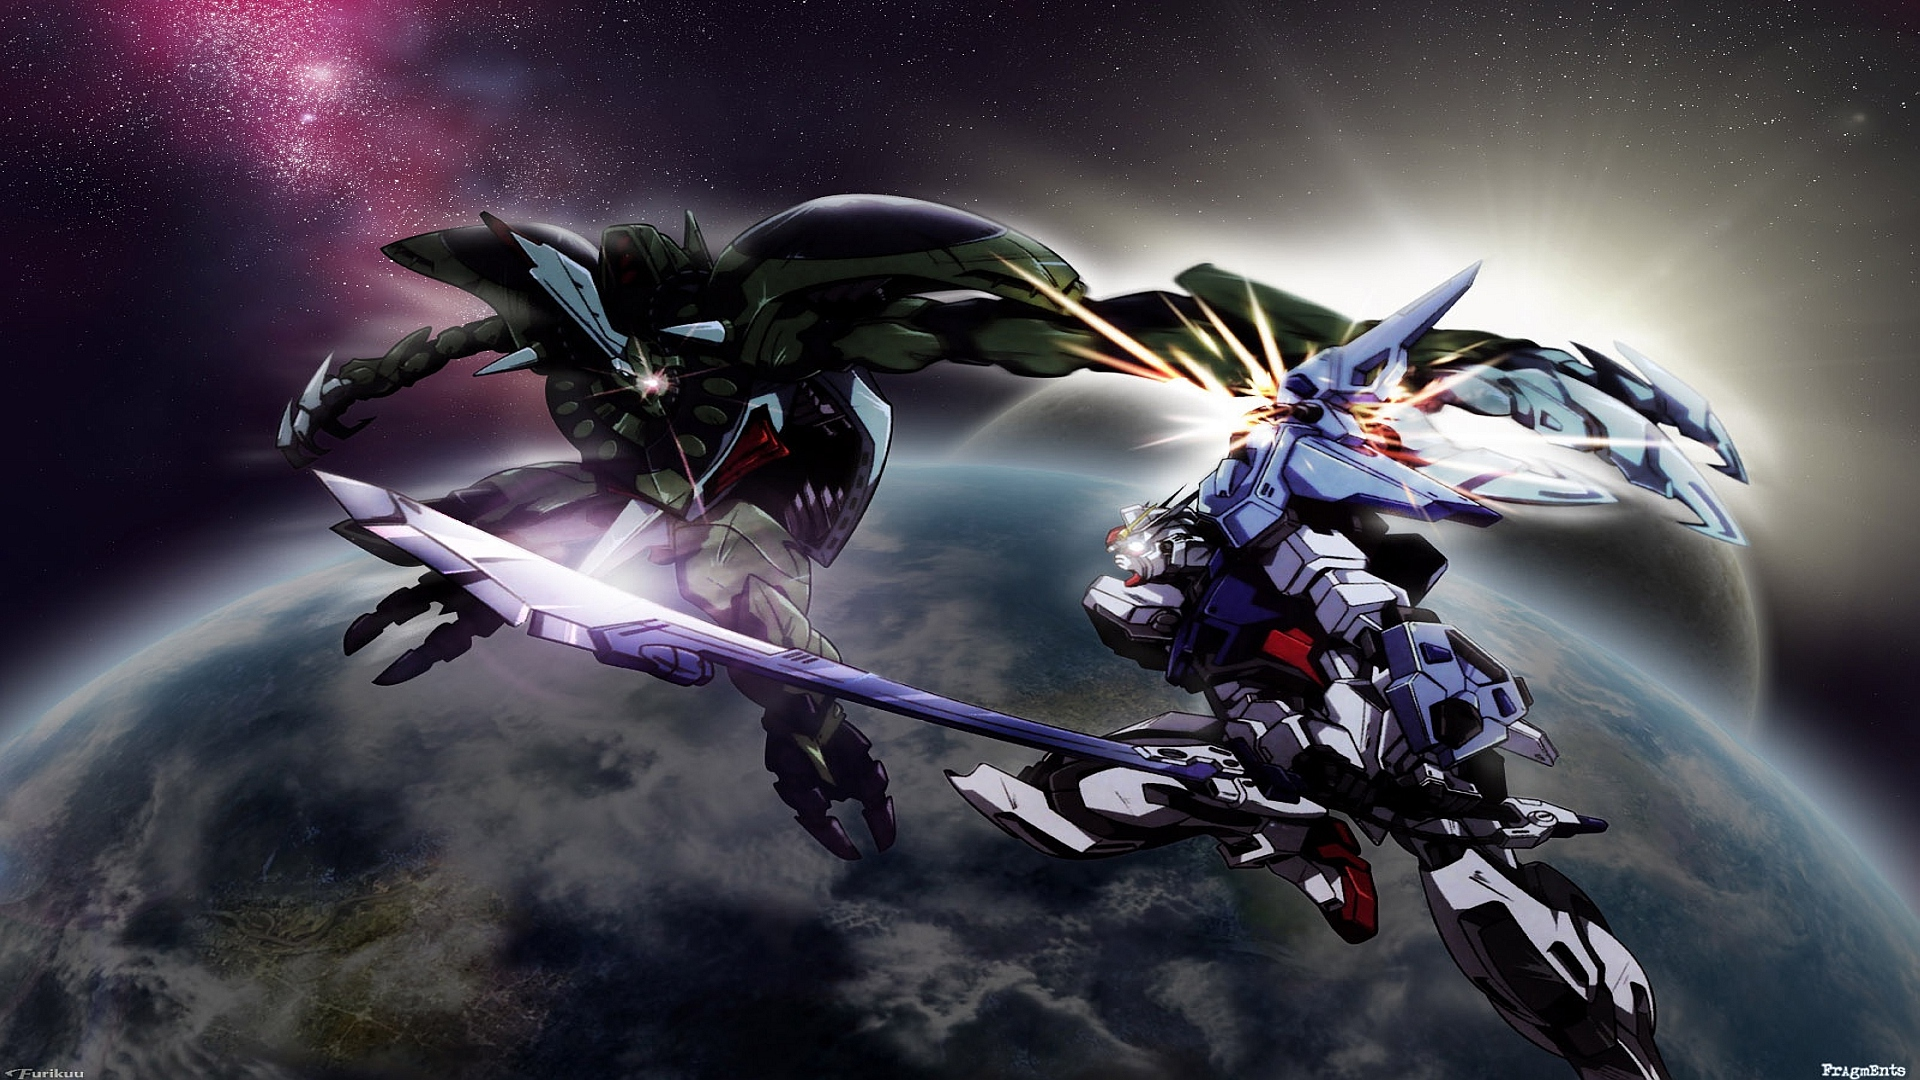 Mobile Suit Gundam SEED HD Wallpaper Zerochan